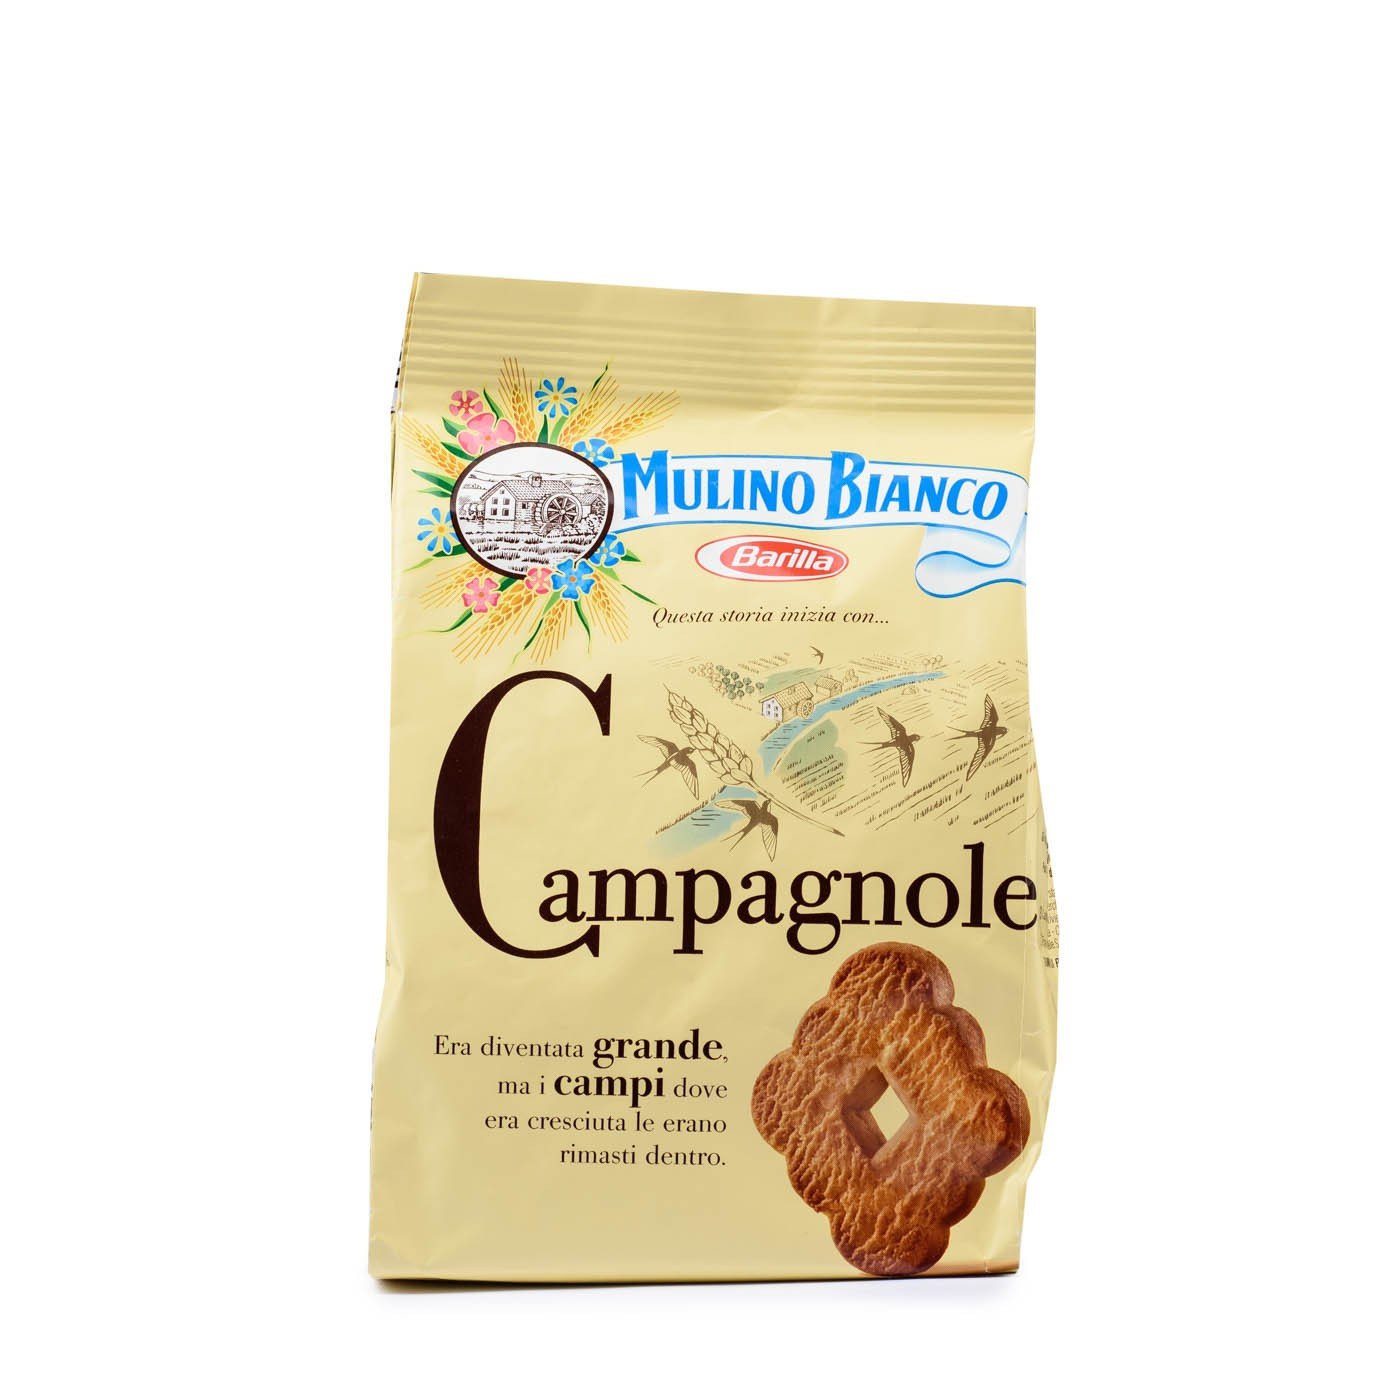 Campagnole Cookies 12.3oz